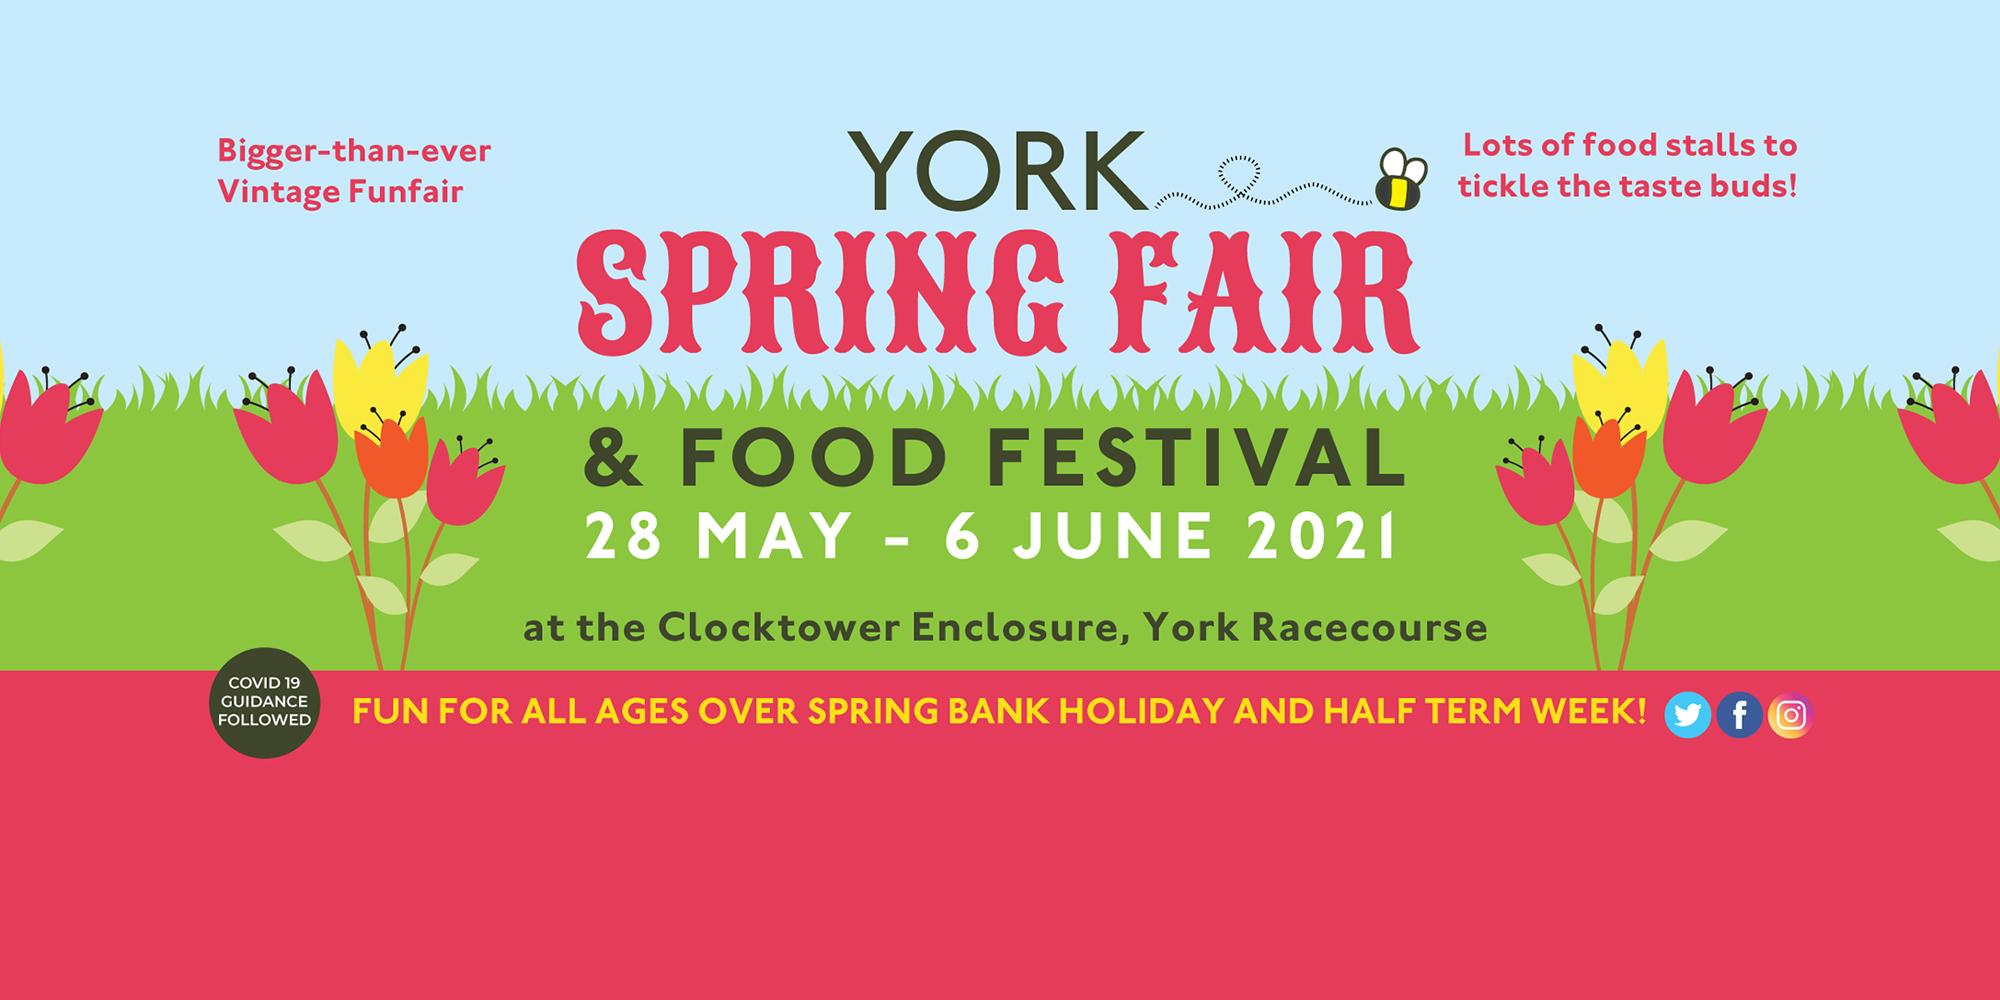 York Spring Fair & Food Festival at York Racecourse